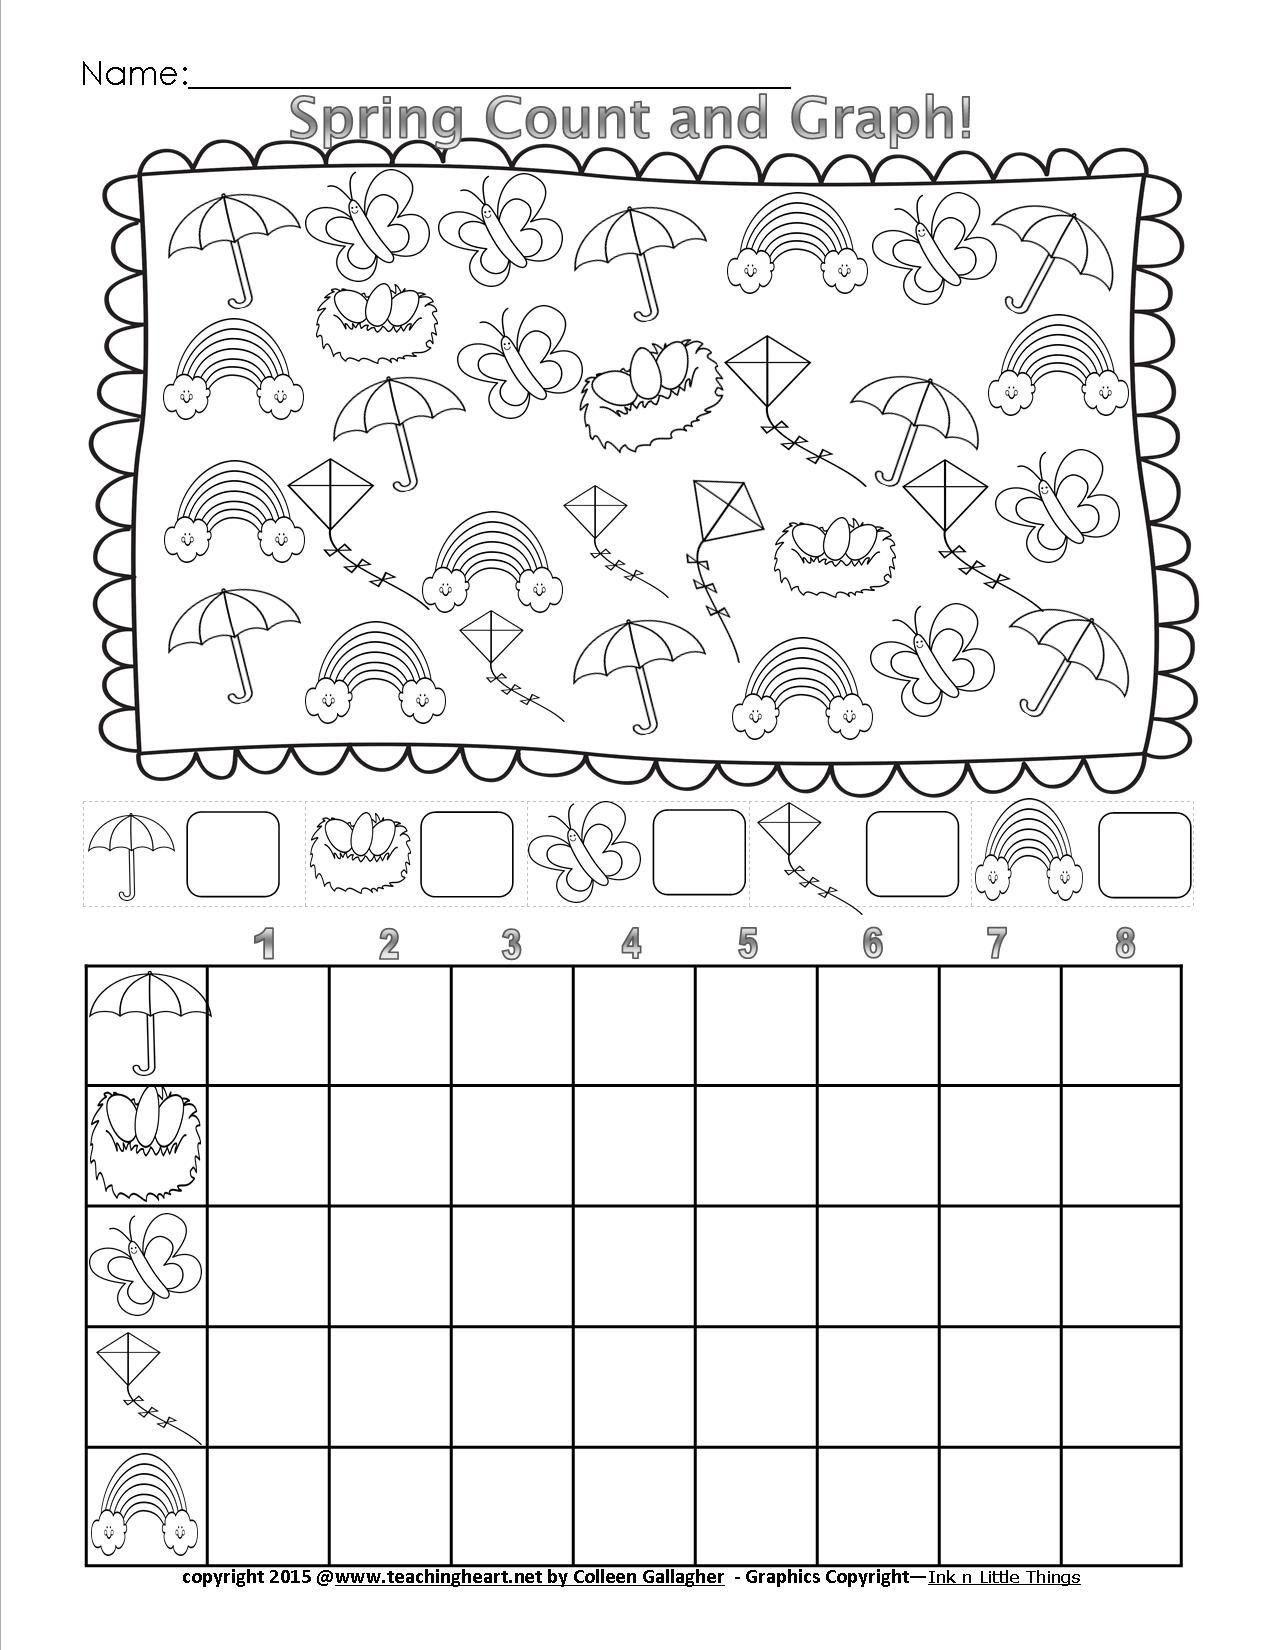 Spring Worksheets For Kindergarten Spring Count And Graph